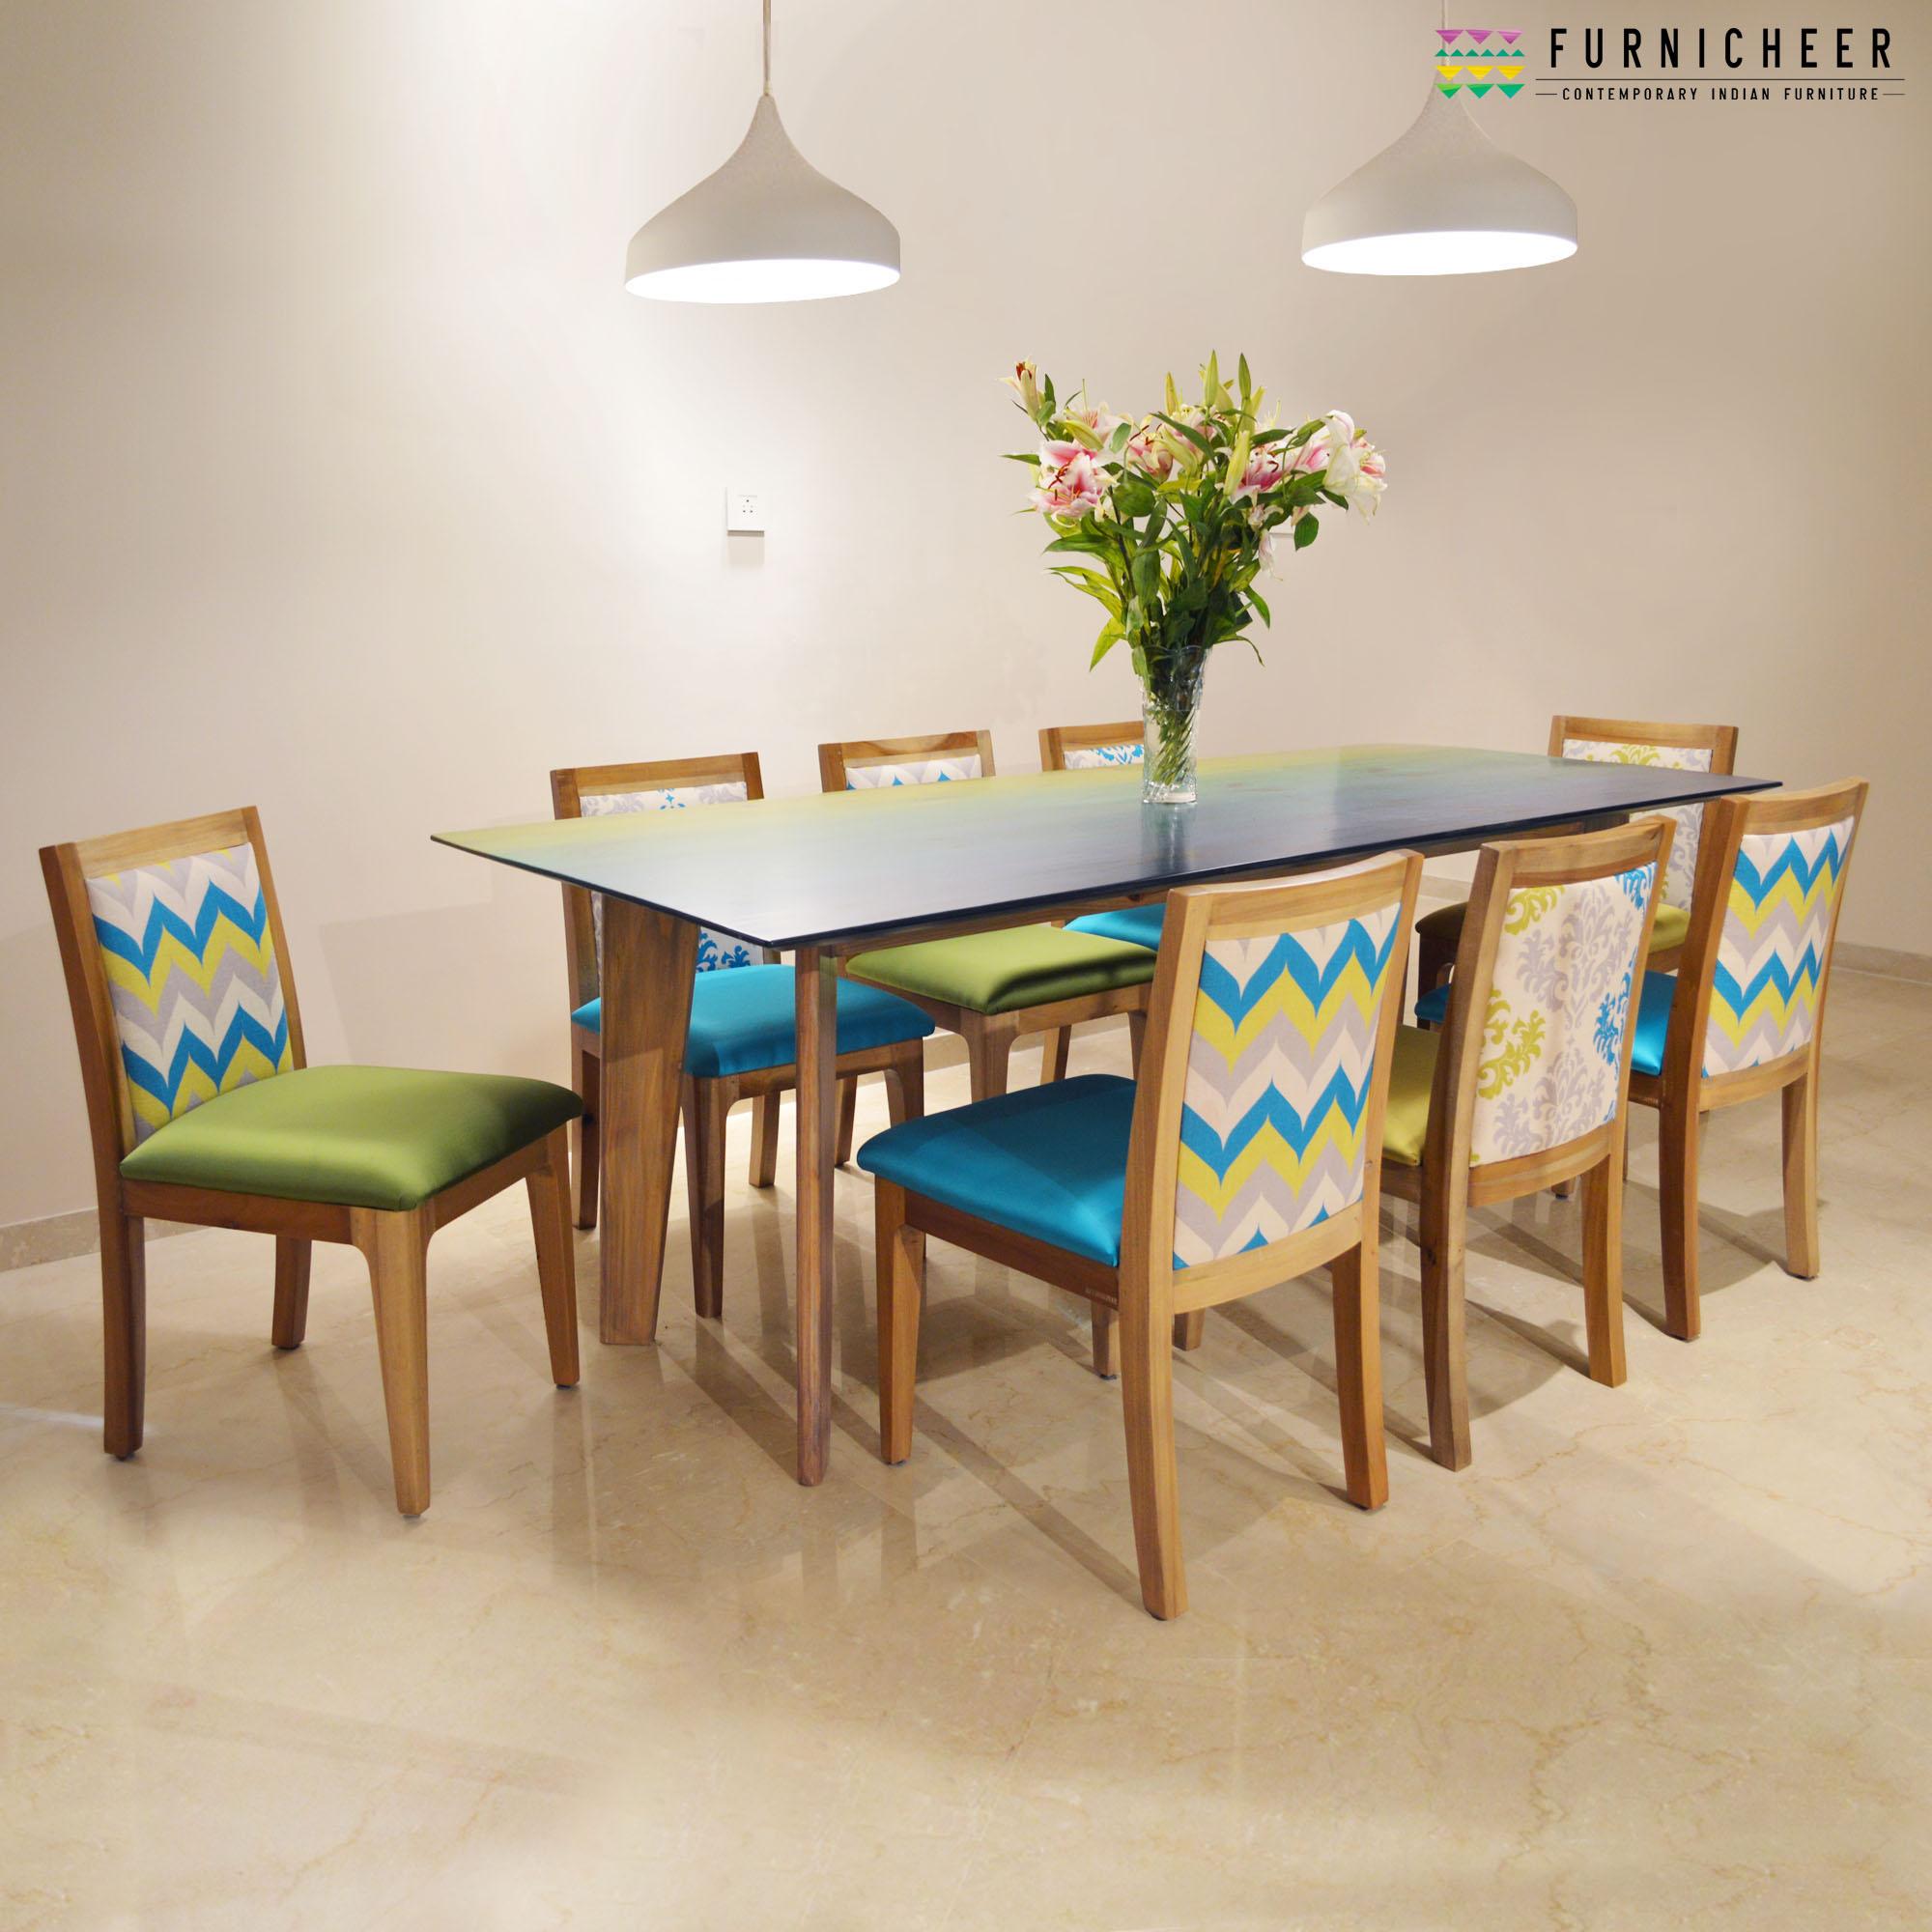 1.MALDIVES 8 SEATER DINING SET BGDT8429